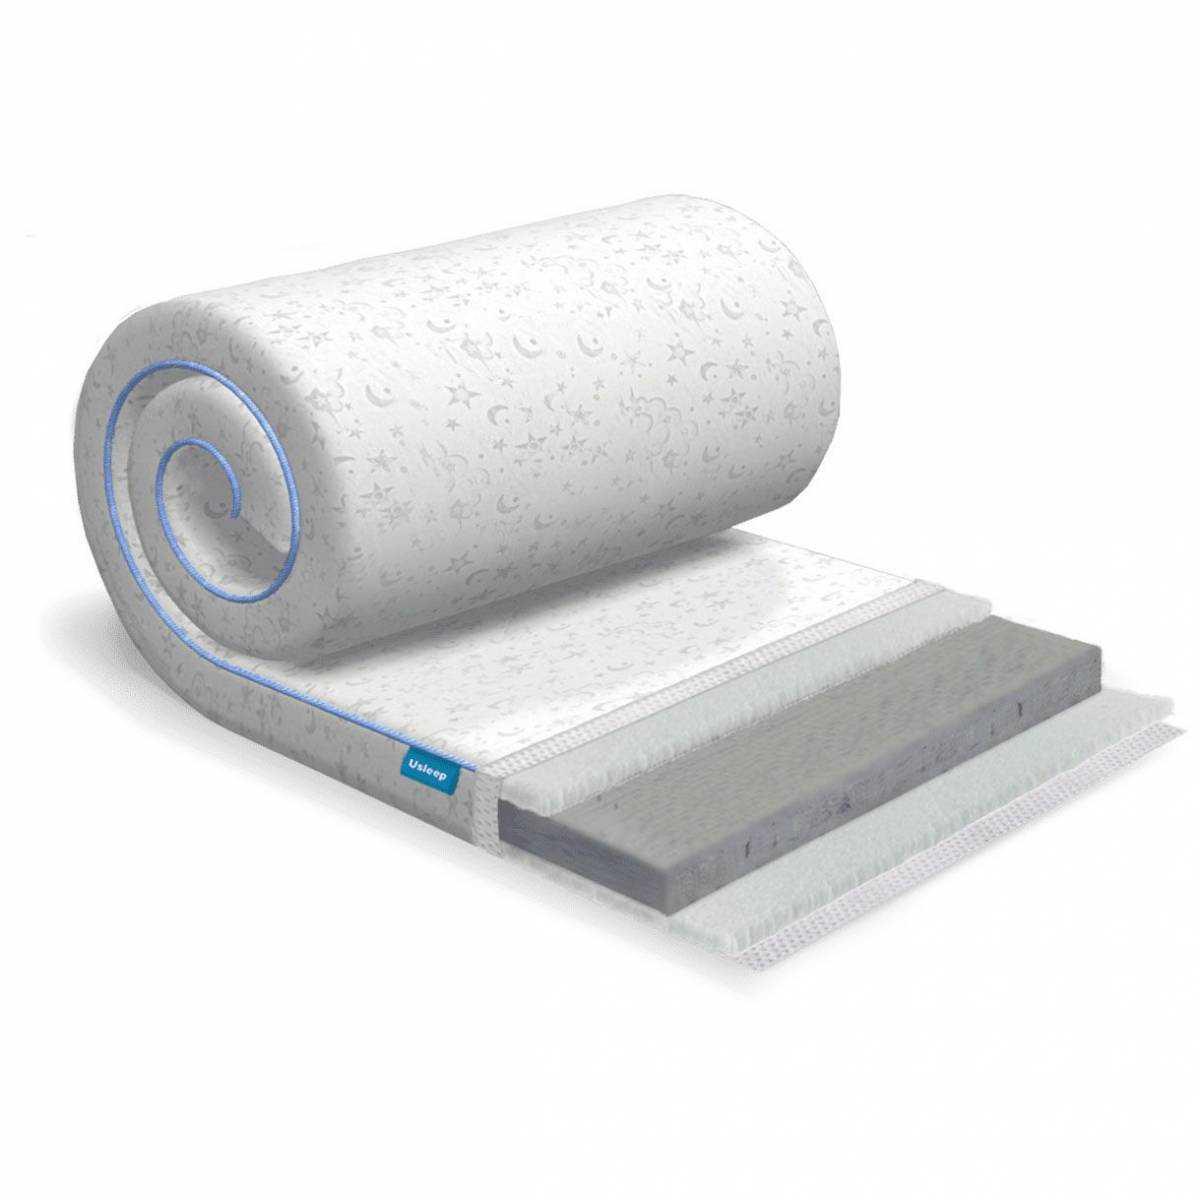 Топпер-футон USLEEP SleepRoll Air Comfort 3+1 Lite Air Comfort 3+1 Lite USLEEP